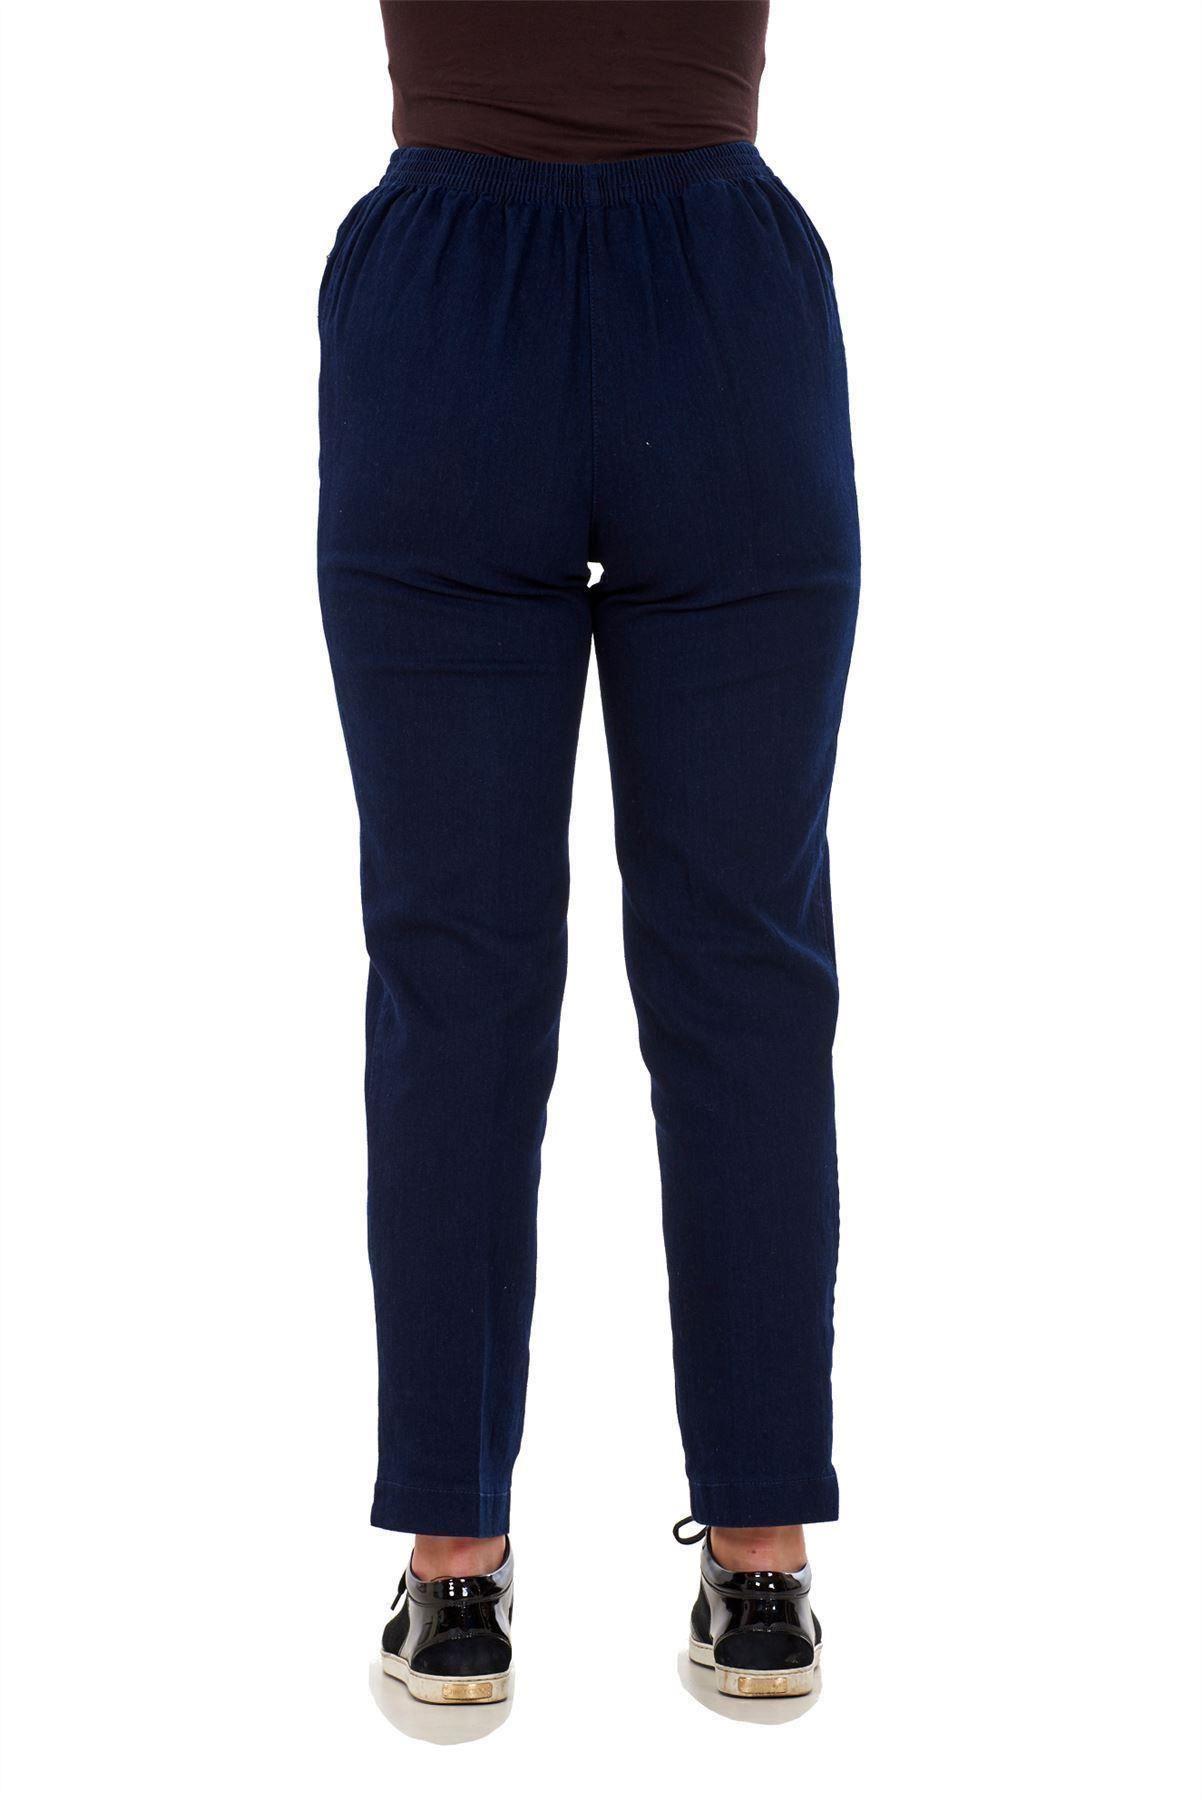 Ladies-Women-Trousers-Rayon-Cotton-Pockets-Elasticated-Stretch-Black-pants-8-24 thumbnail 13